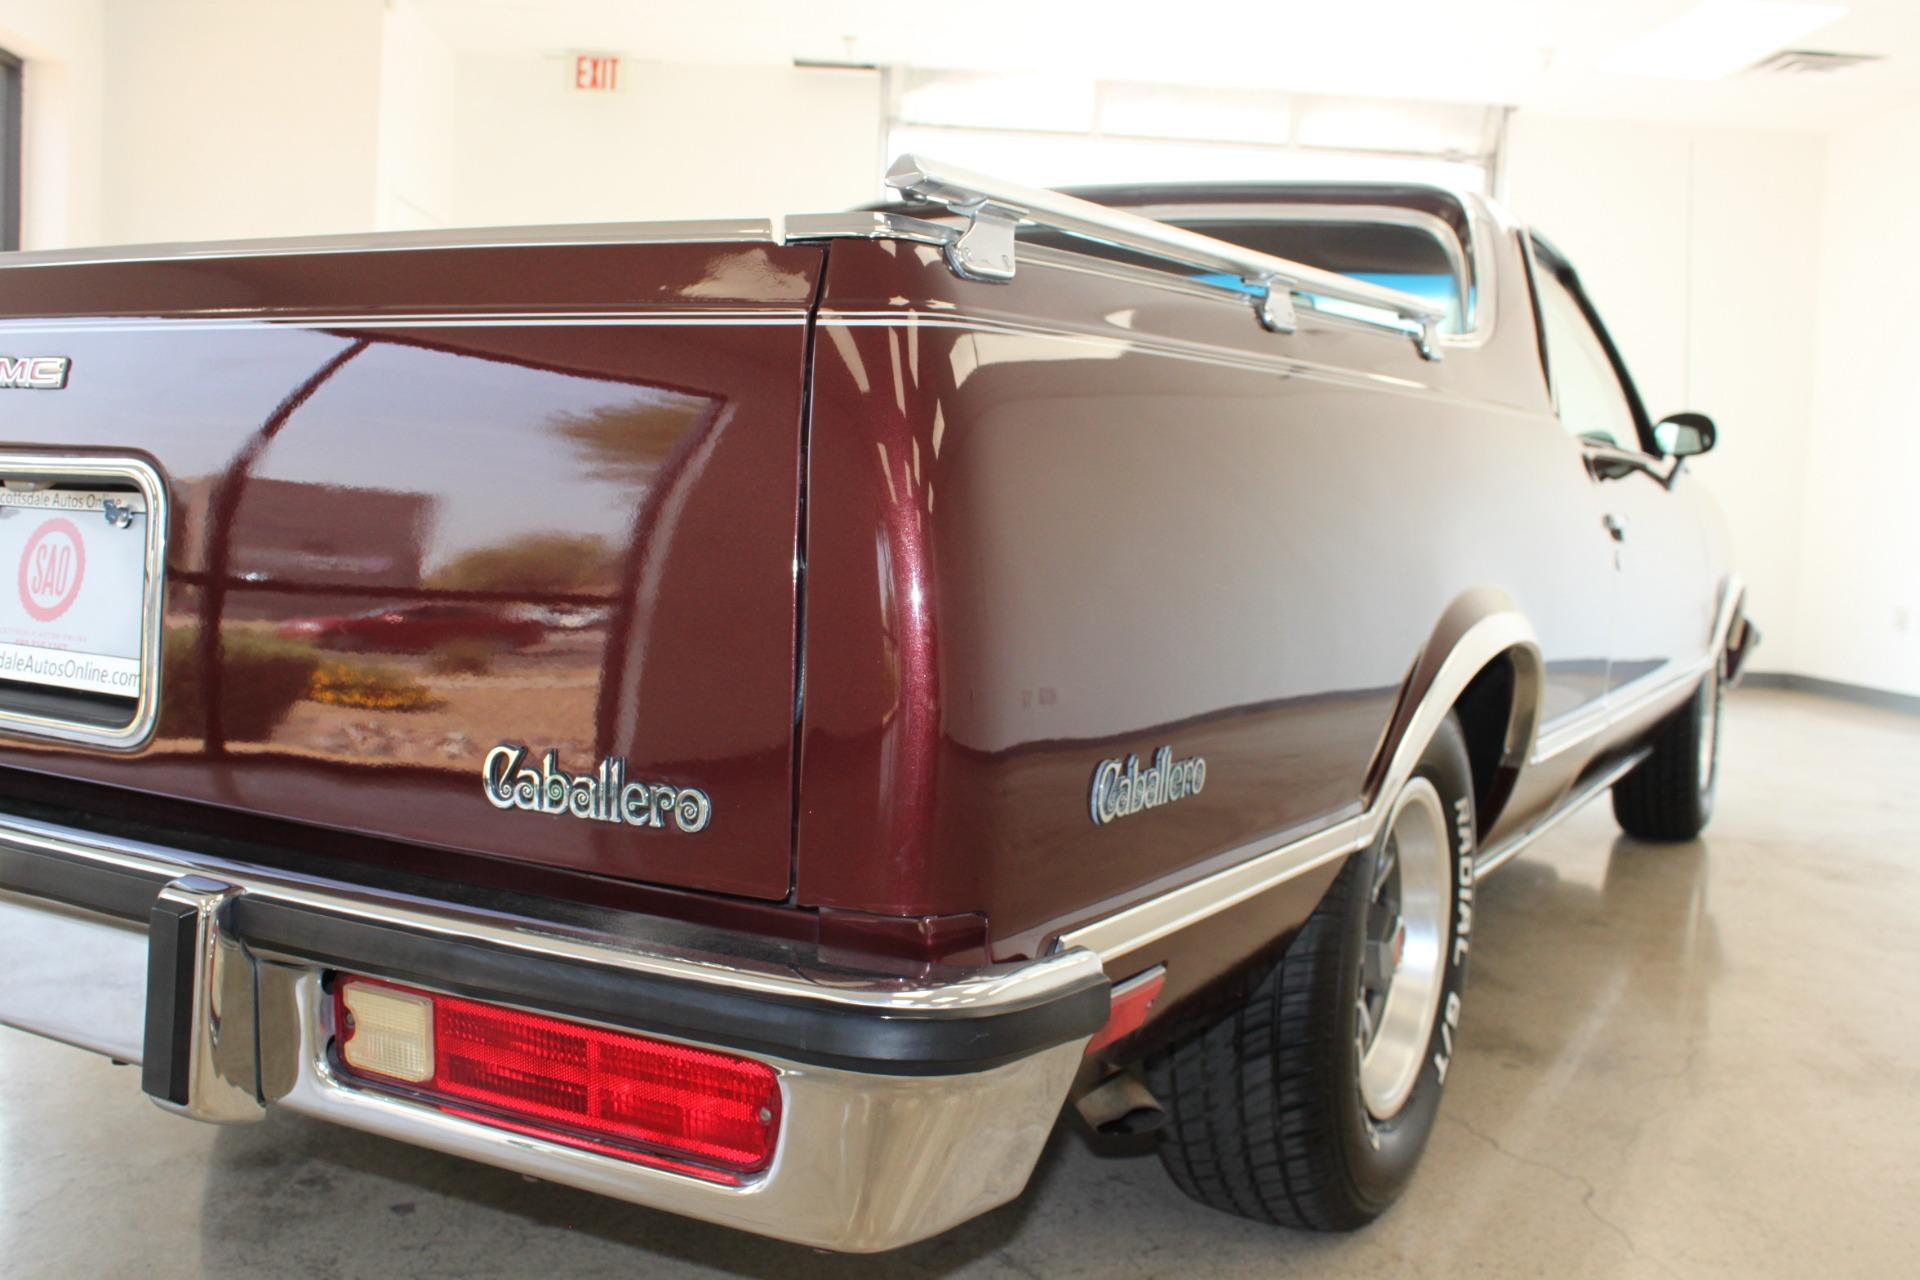 Used-1984-GMC-Caballero-Chevrolet